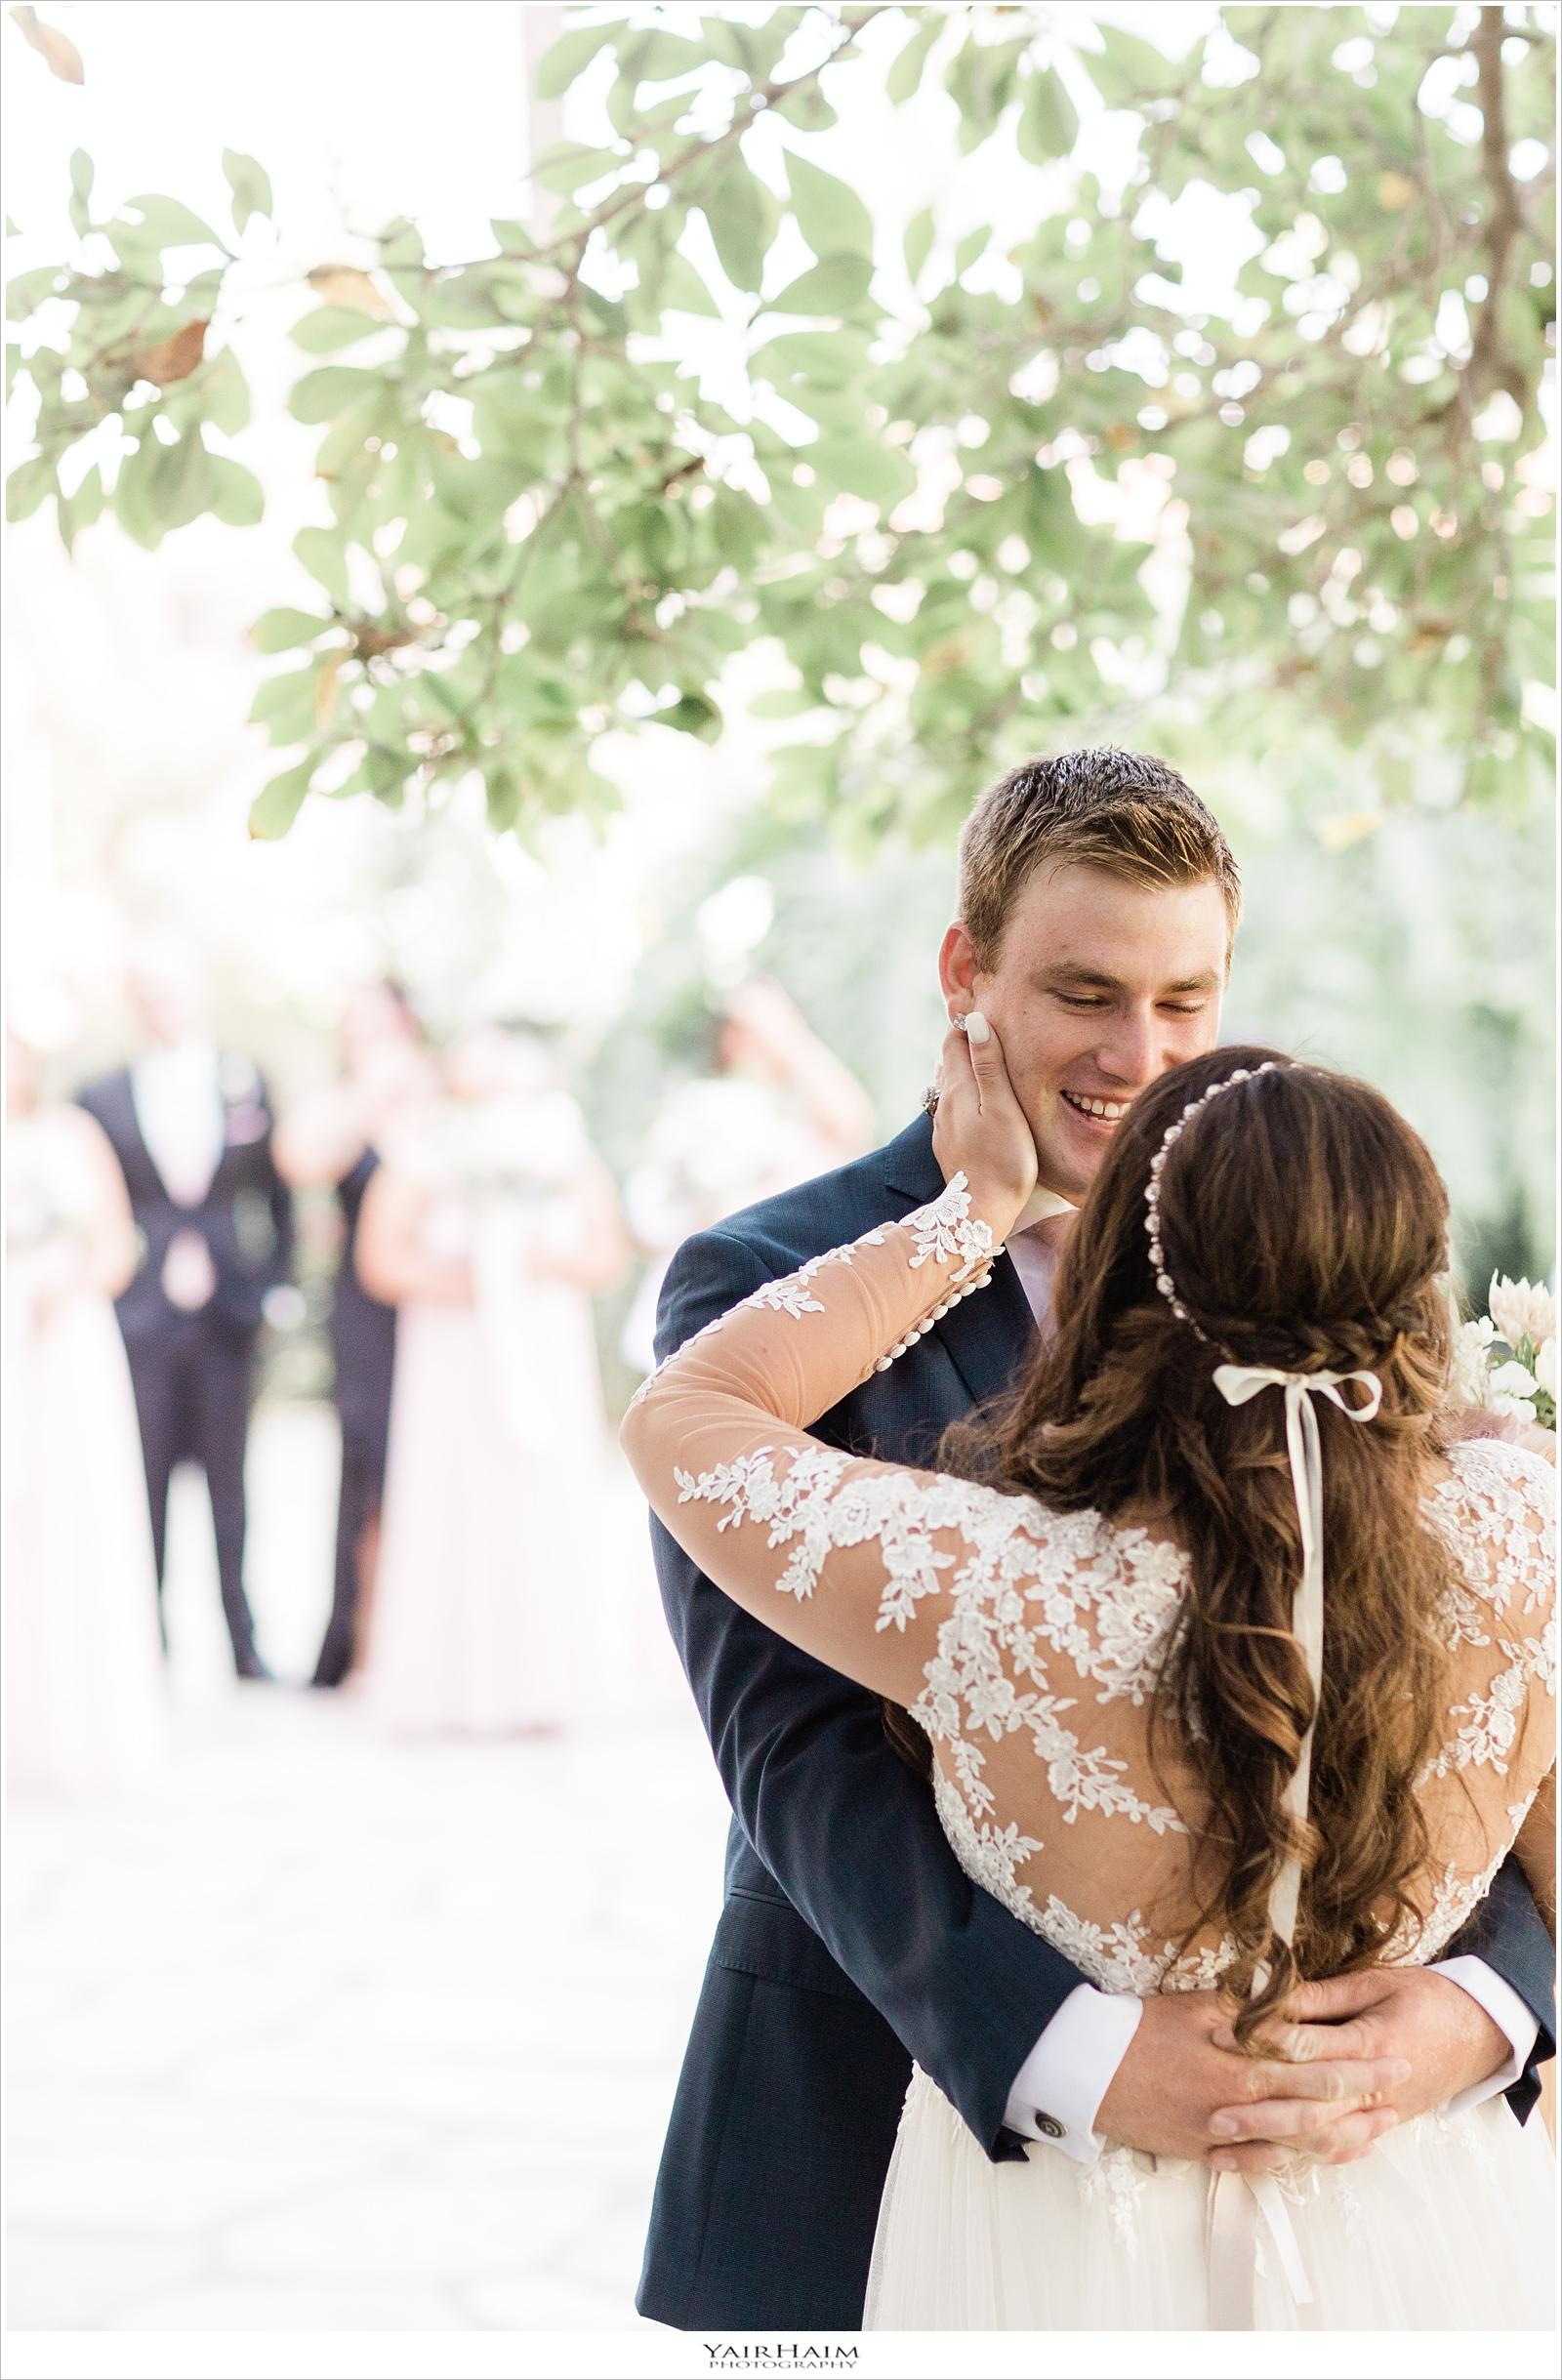 Chrystle-Robbie-wedding-photos-126.JPG